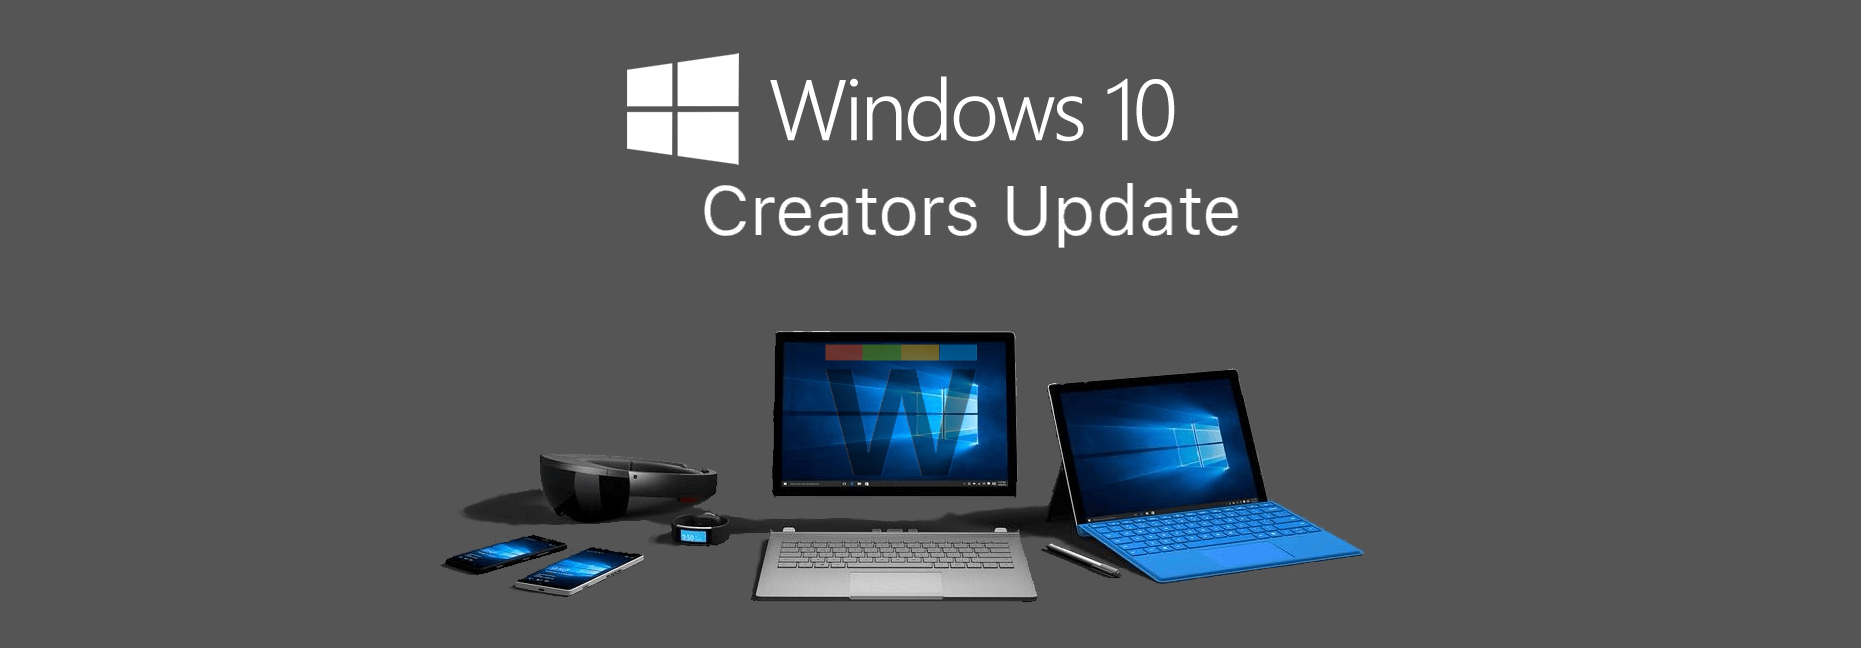 xp镜像安装,微软Win10开发者版本升级 全新文件管理现端倪